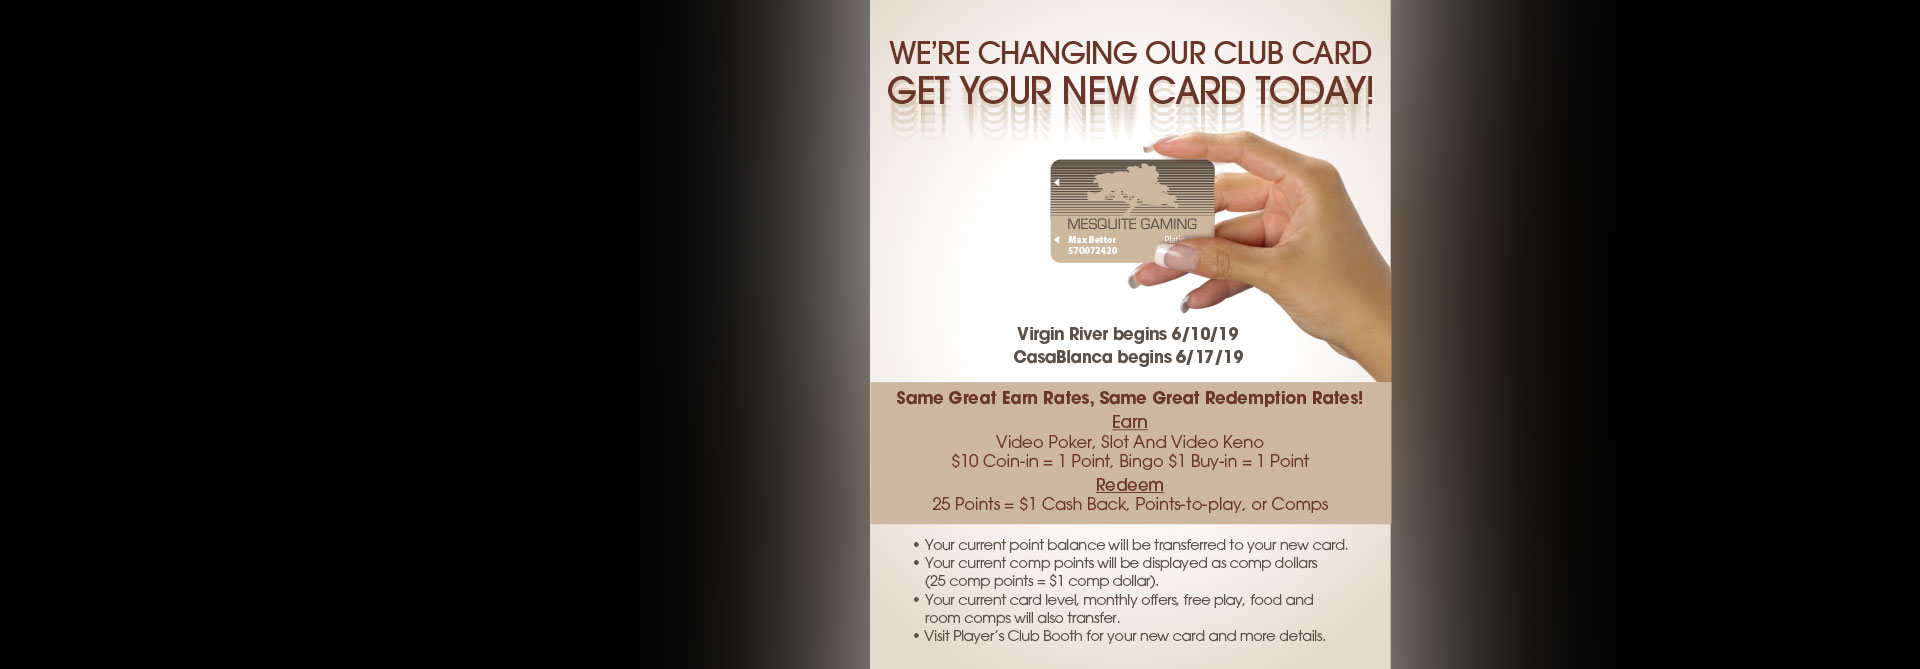 Virgin River Hotel and Casino in Mesquite, NV Virgin River